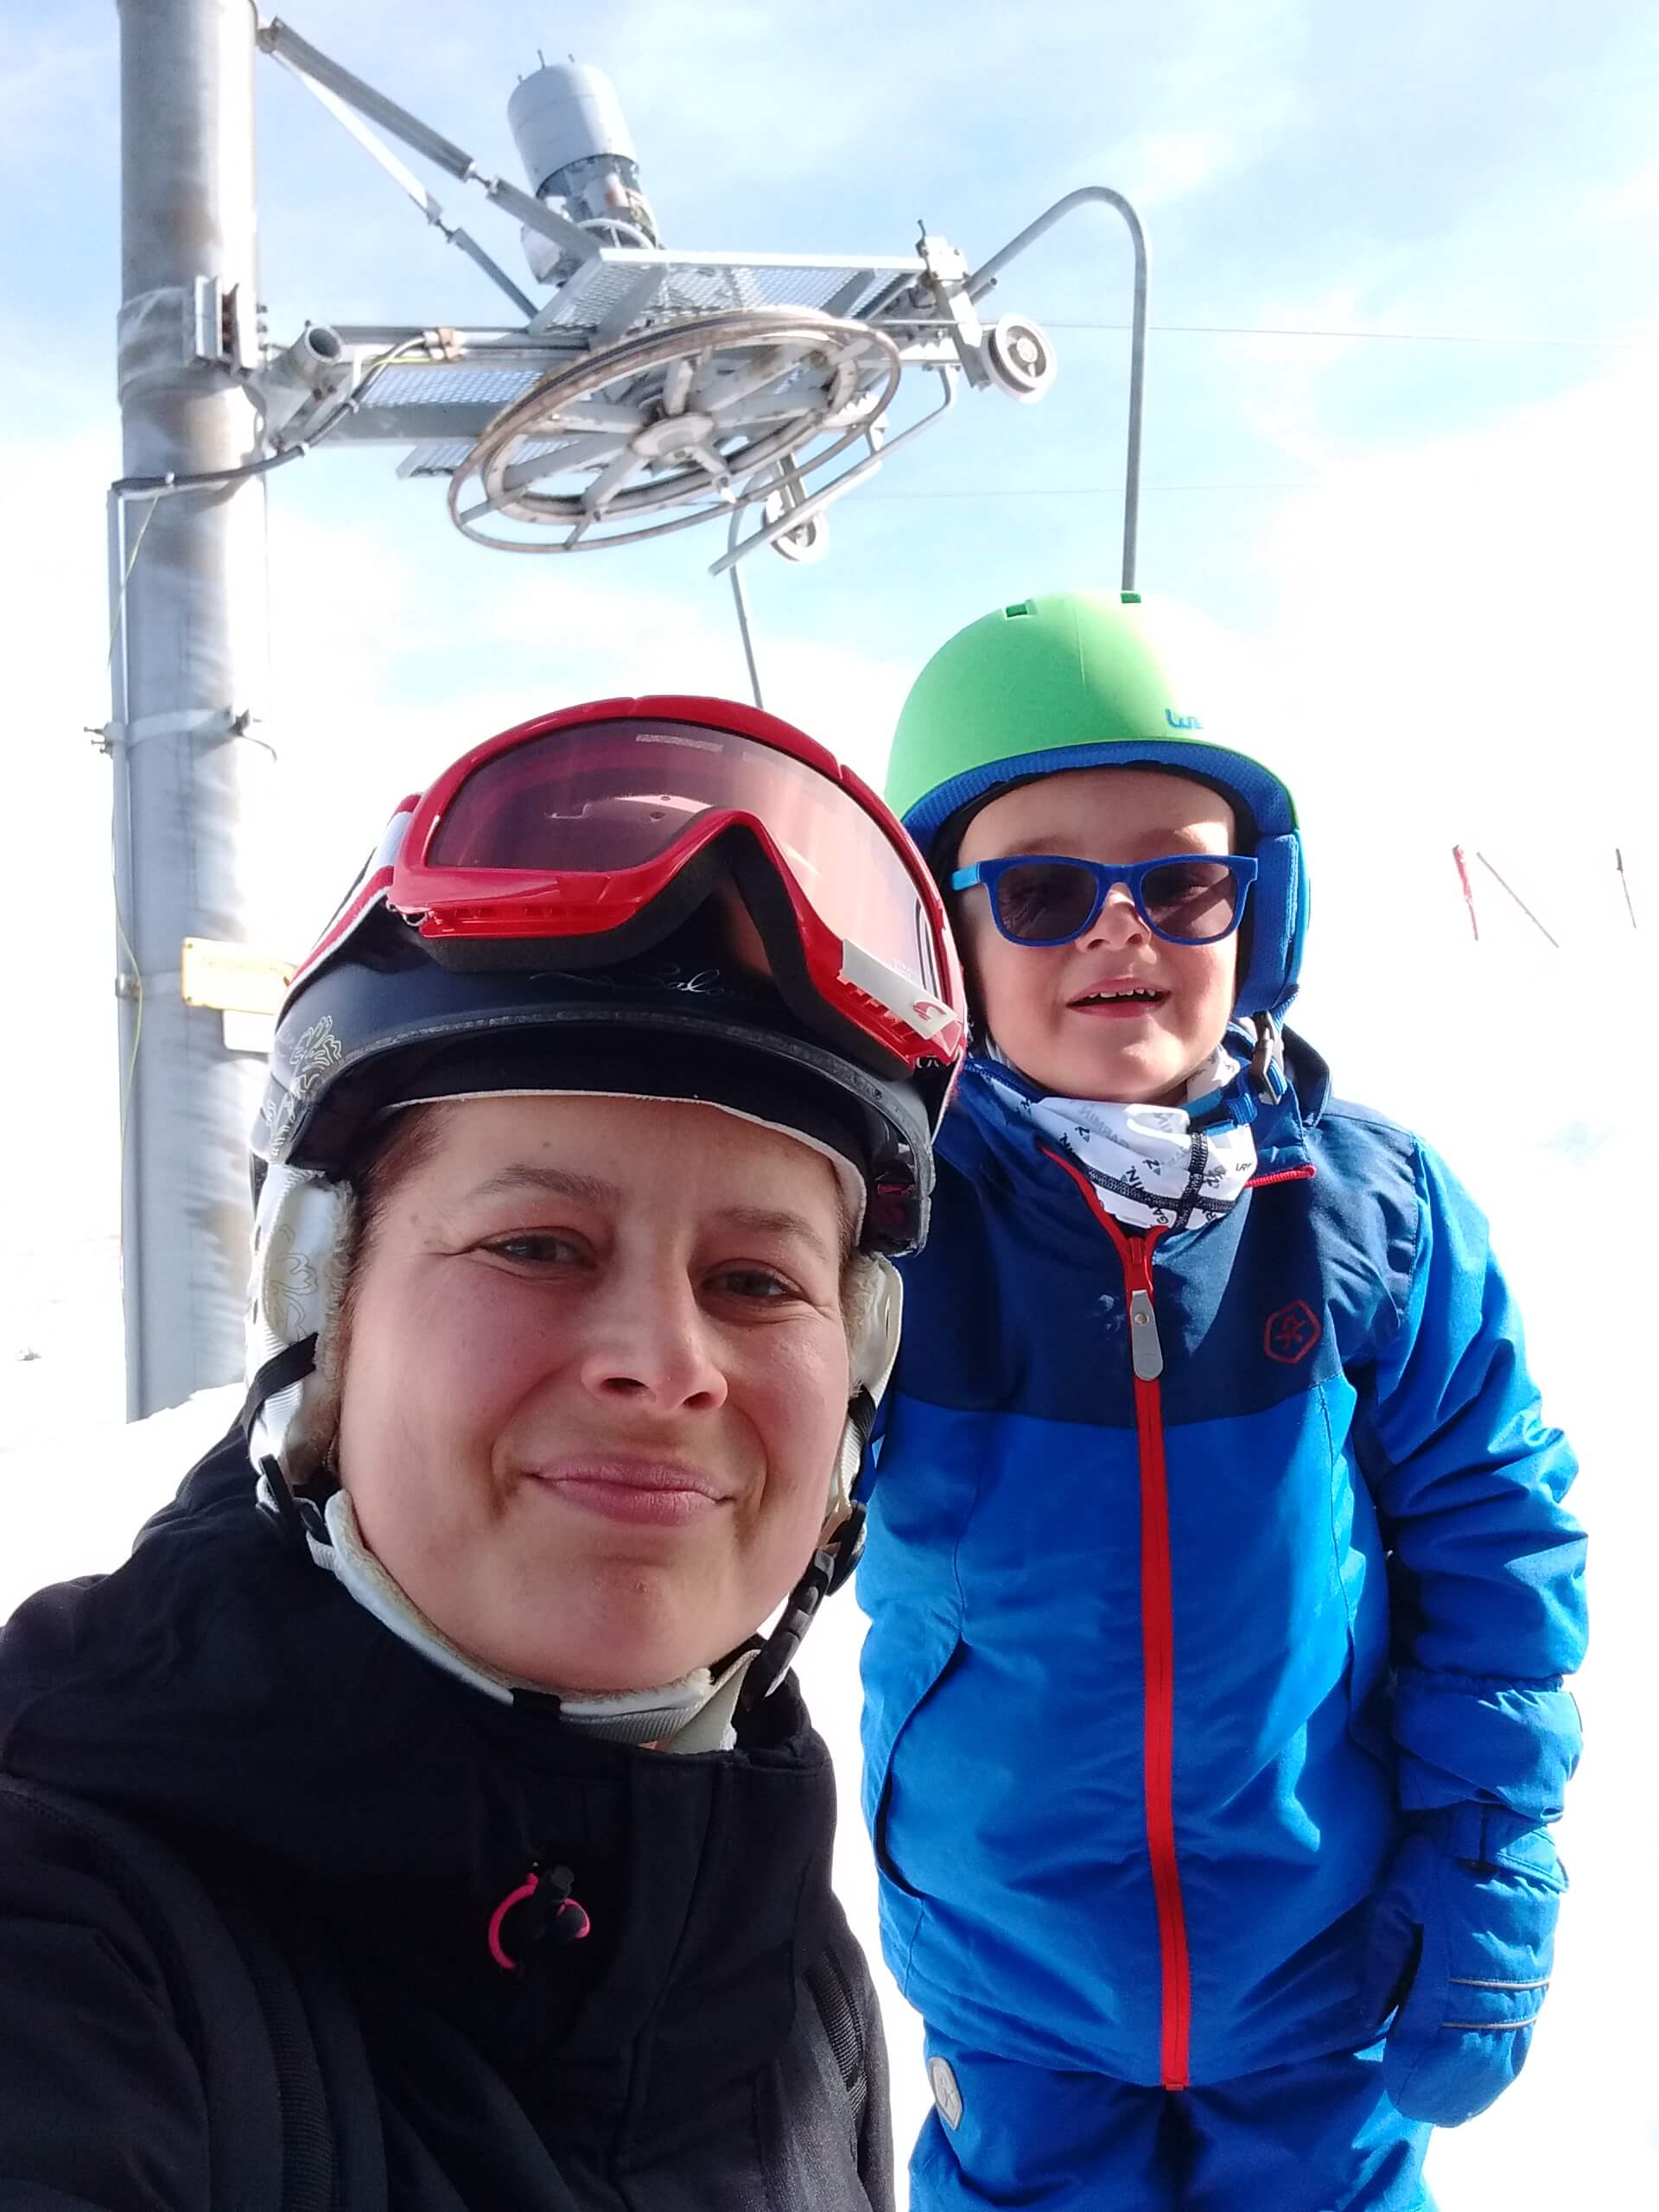 S deťmi na lyže ⛷